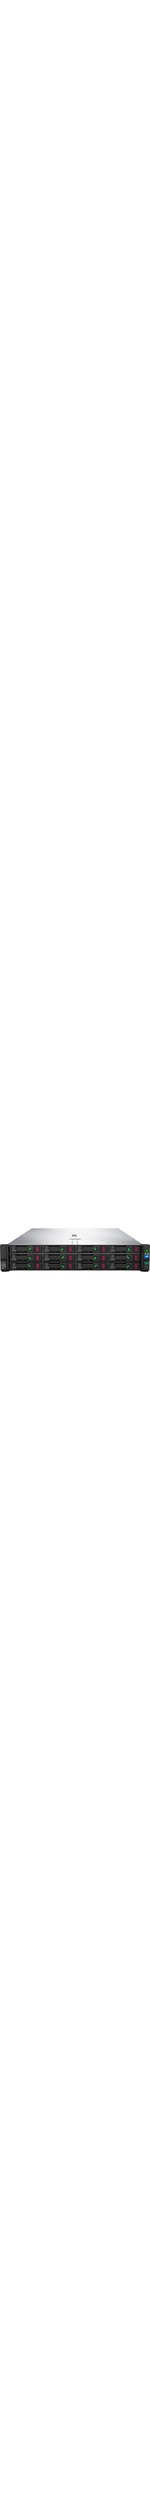 HPE ProLiant DL380 G10 2U Rack Server - 1 x Xeon Gold 5218 - 32 GB RAM HDD SSD - P408i-A Controller - Serial ATA/600, 12Gb/s SAS Controller - 2 Processor Support - U